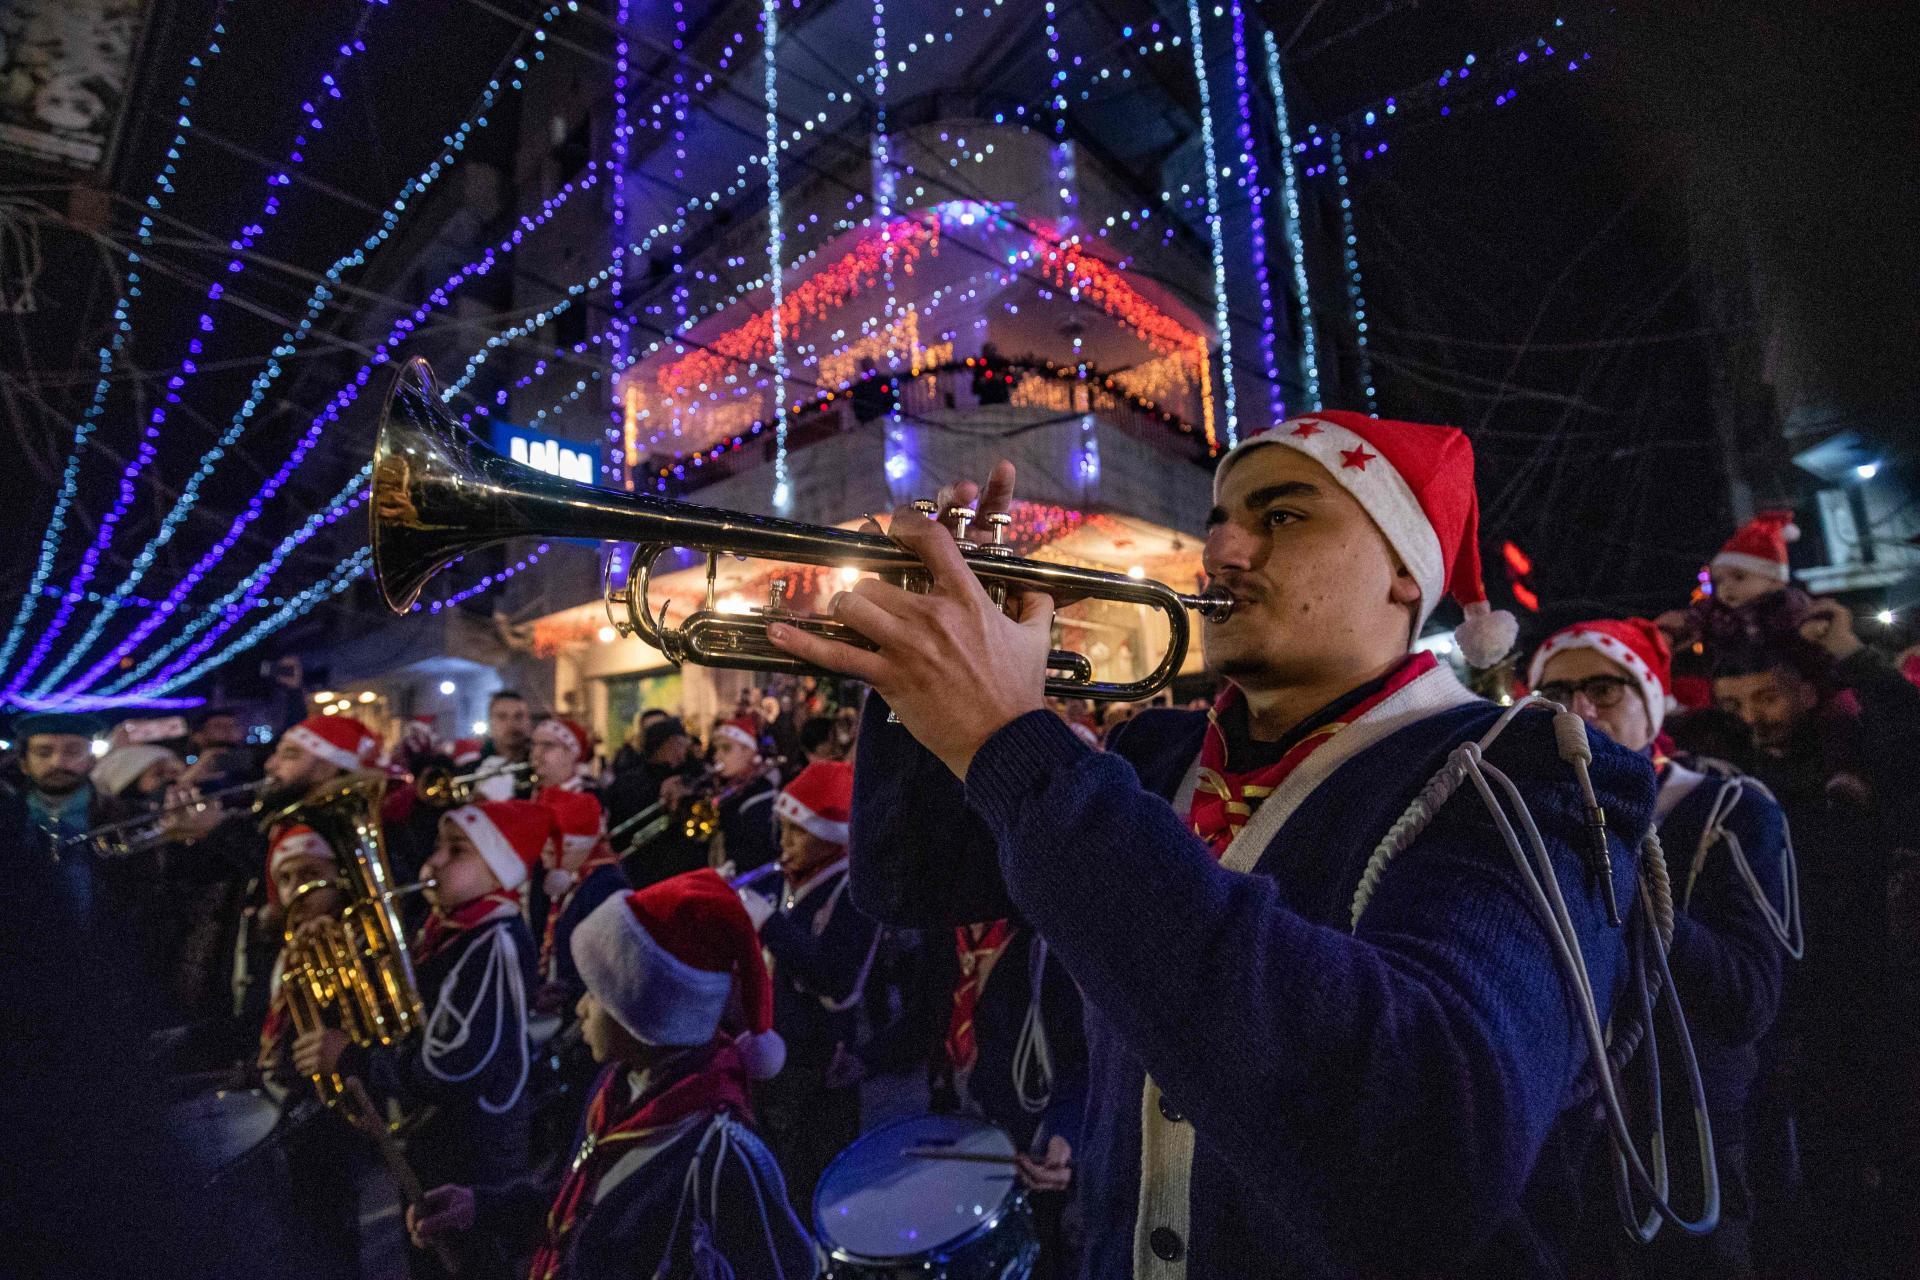 La banda musicale partecipa alle celebrazioni natalizie a Kameshlia, Siria, Kurdistan.